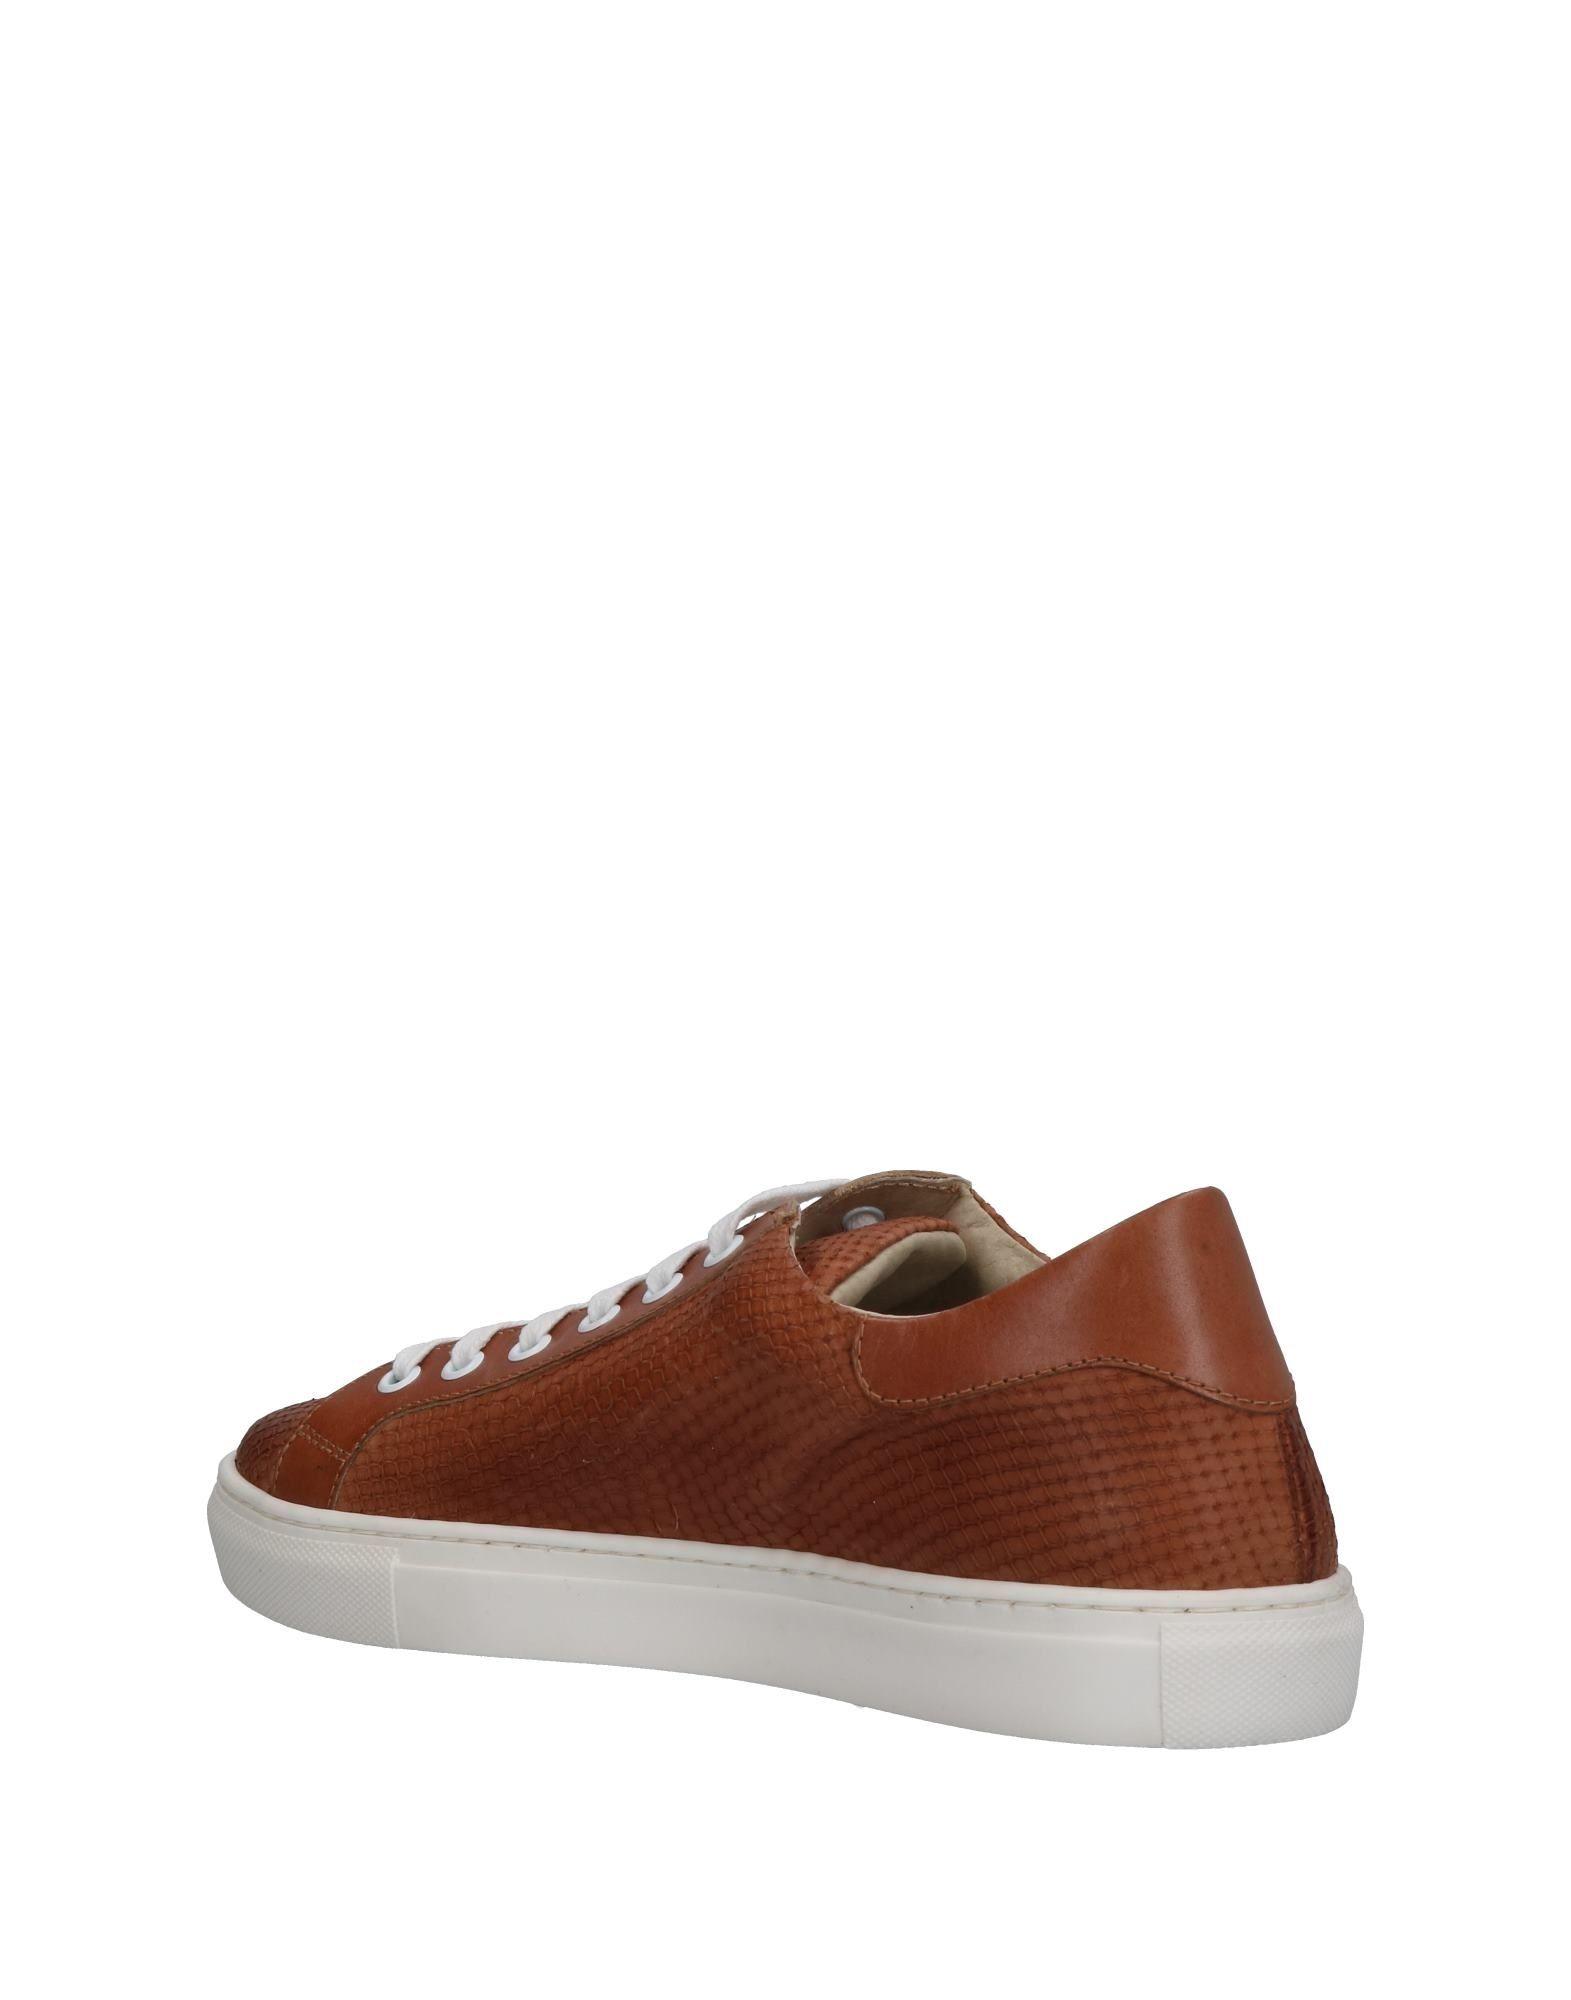 Tsd12 Sneakers Damen Damen Sneakers  11337866UP d14d2b